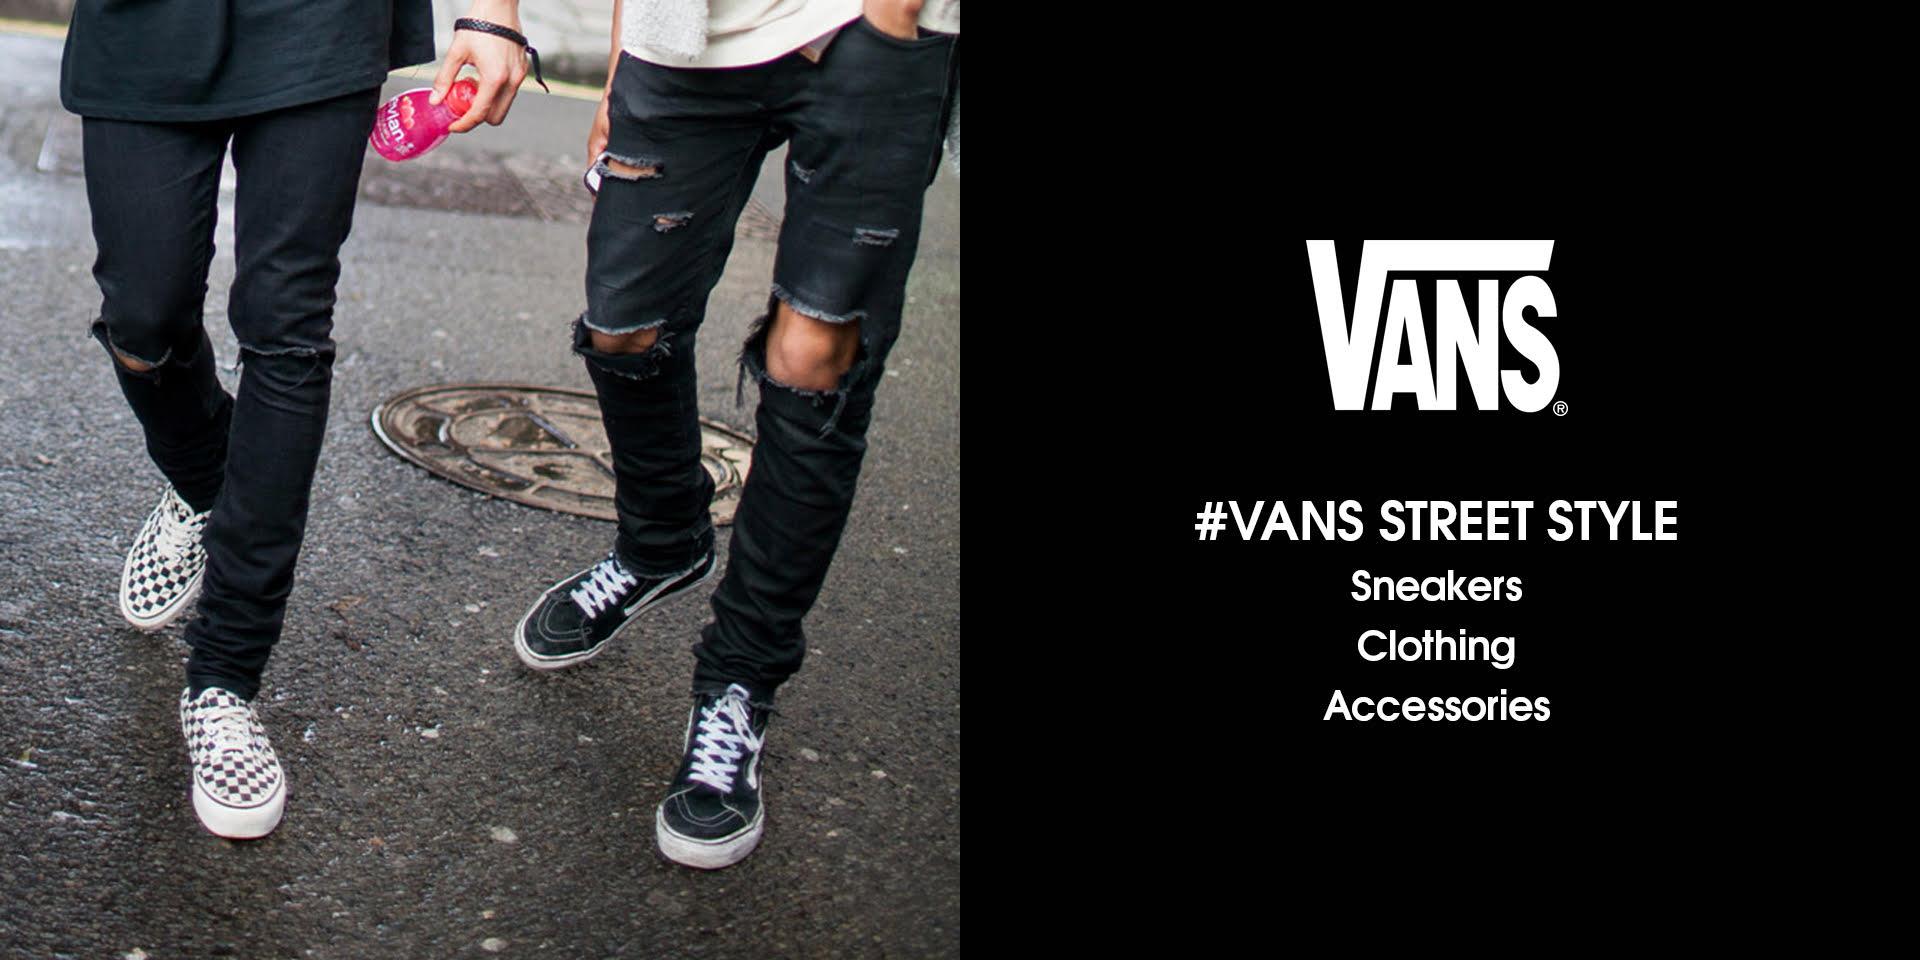 Vans Street Style